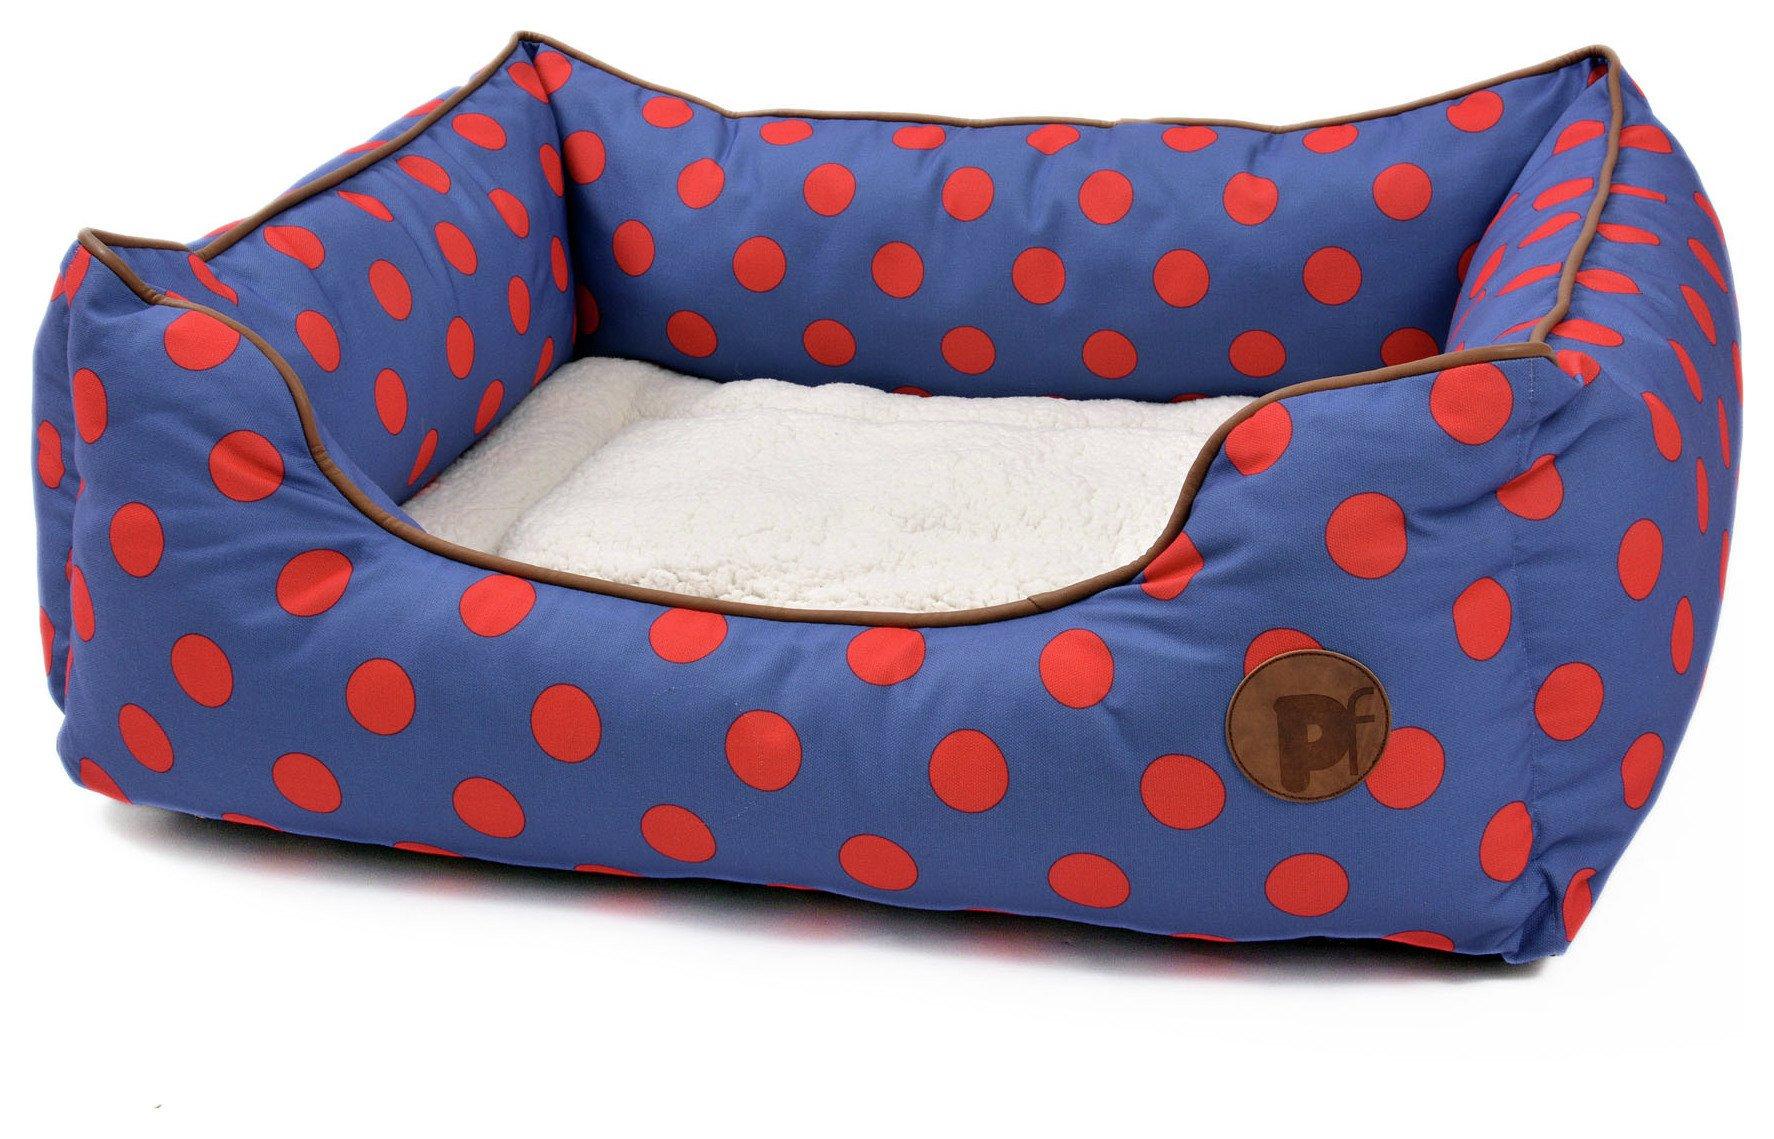 petface-blue-spots-square-bed-large